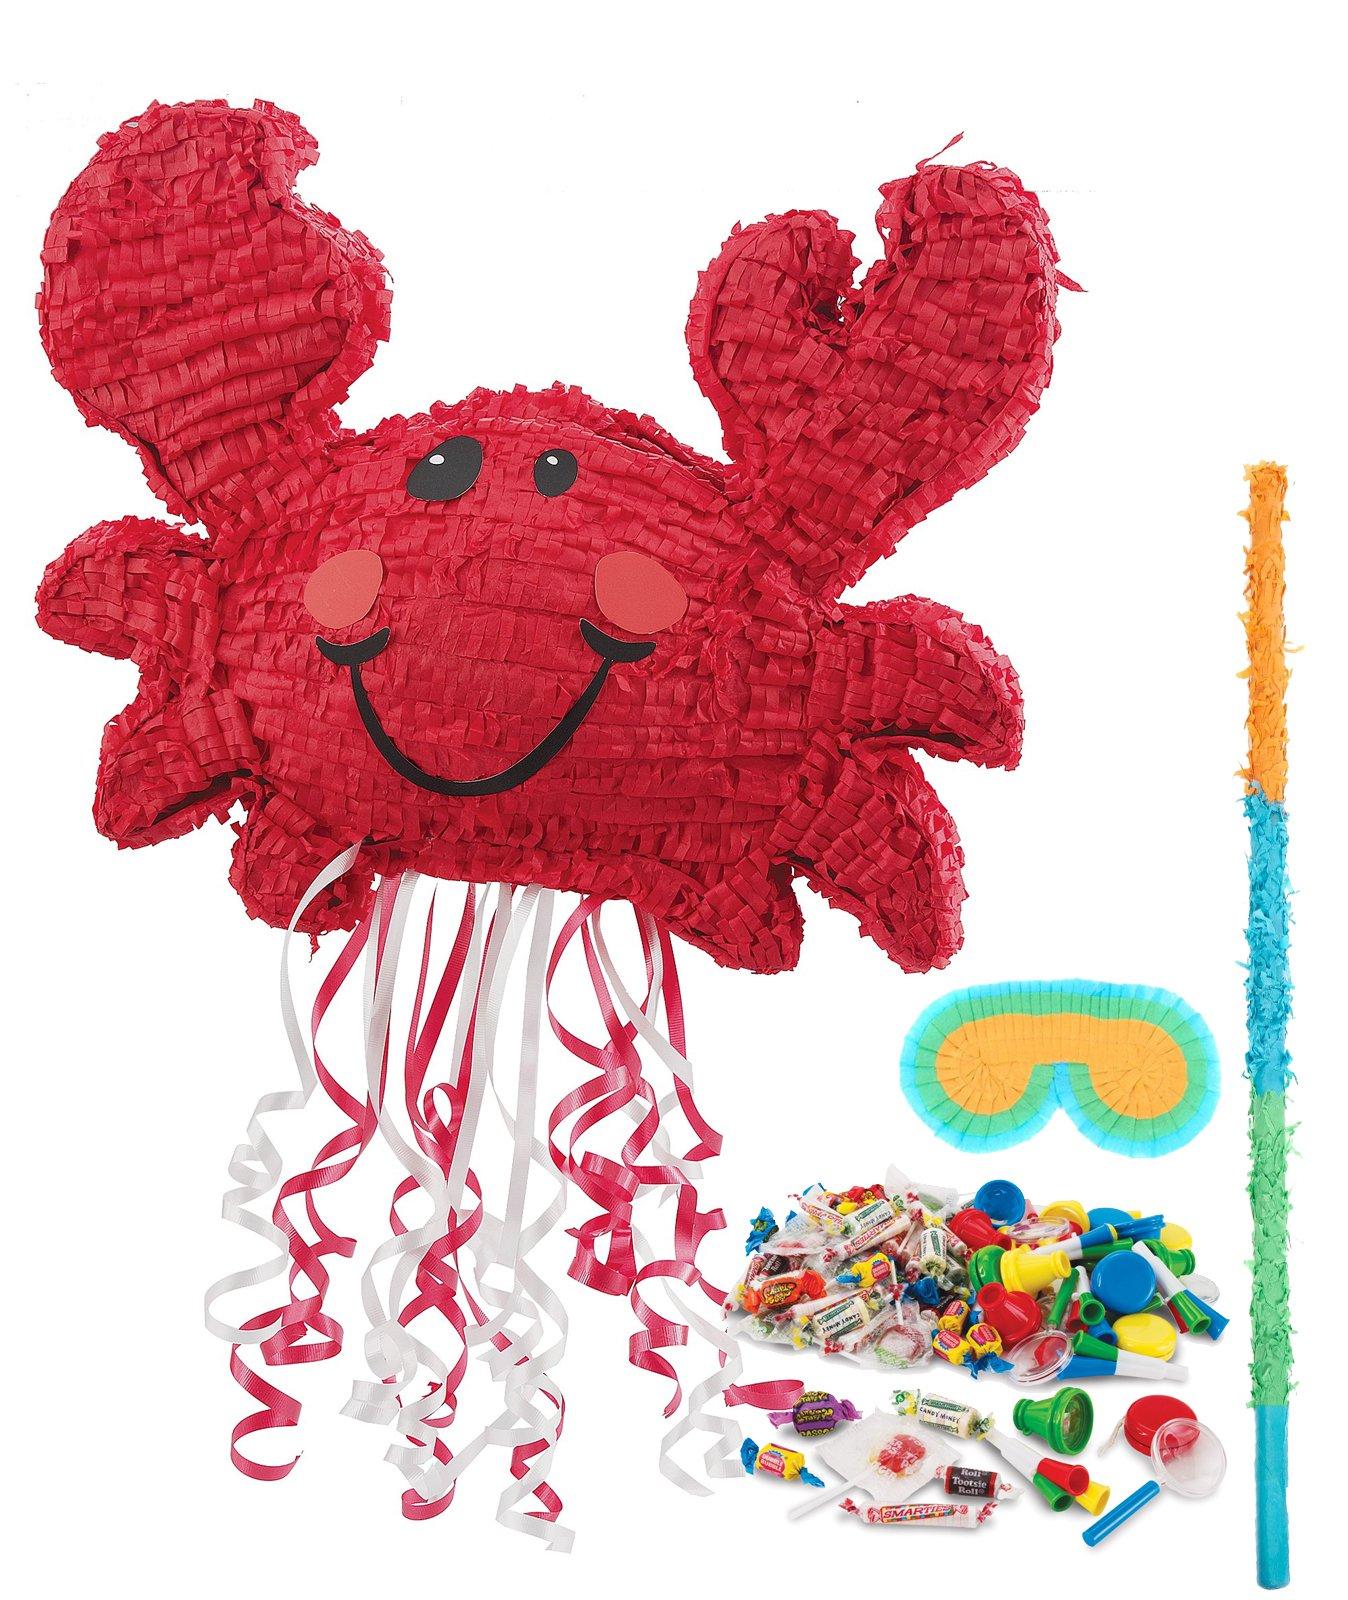 BirthdayExpress Nautical Party Supplies - Crab Pinata Kit